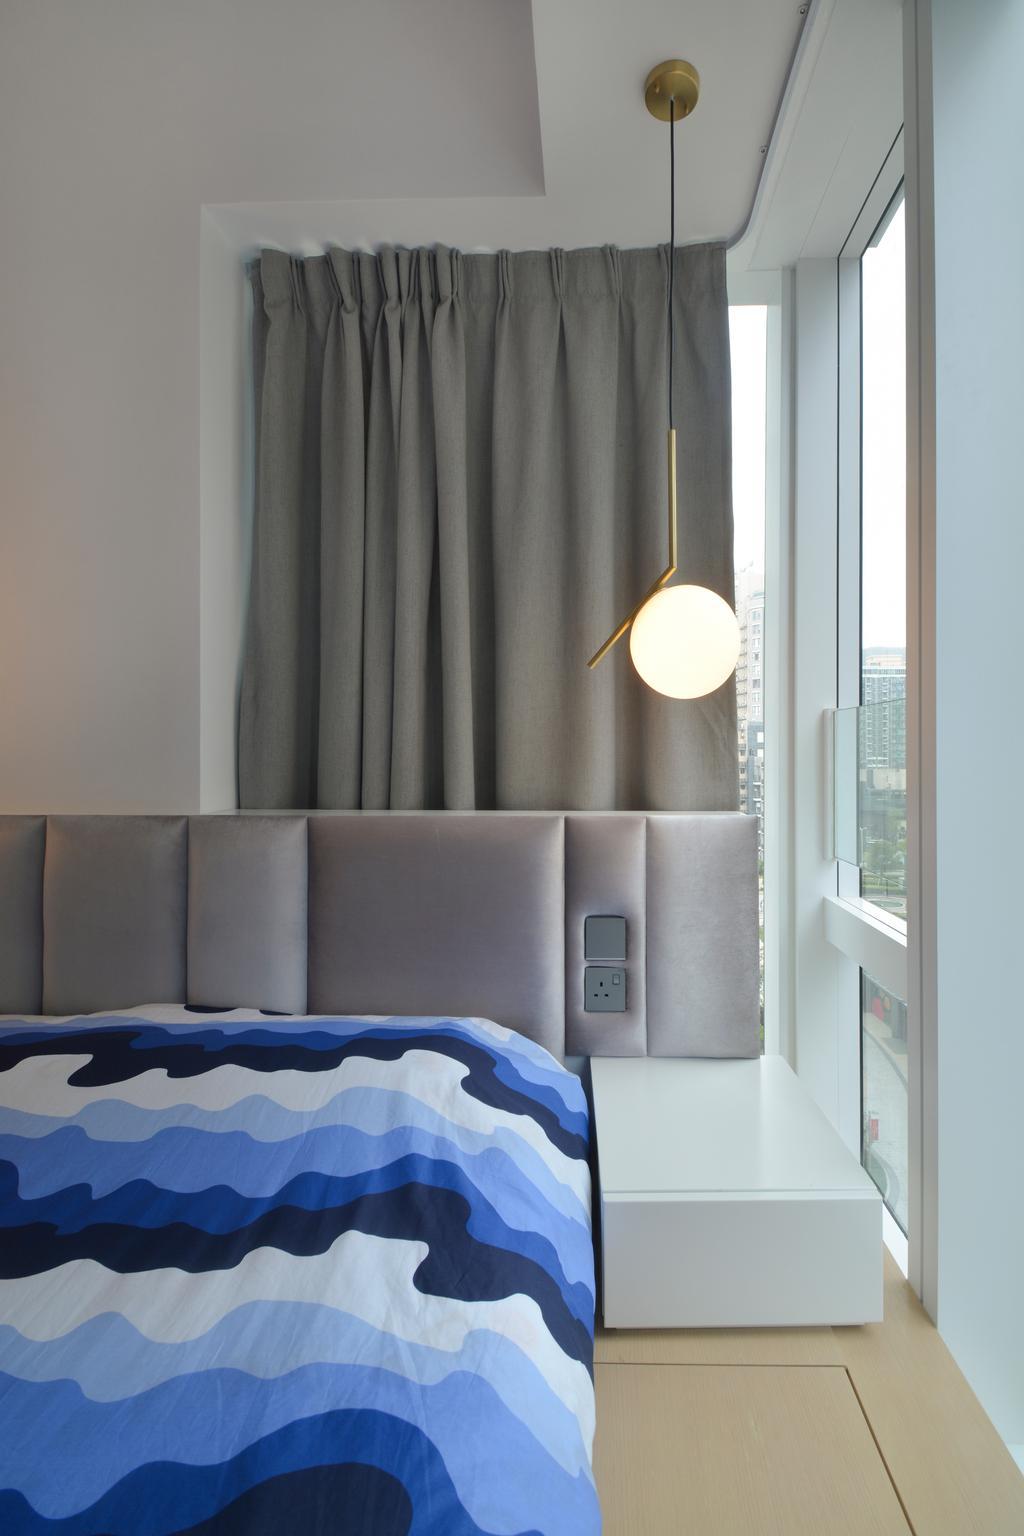 私家樓, 睡房, Monterey, 室內設計師, Space Design